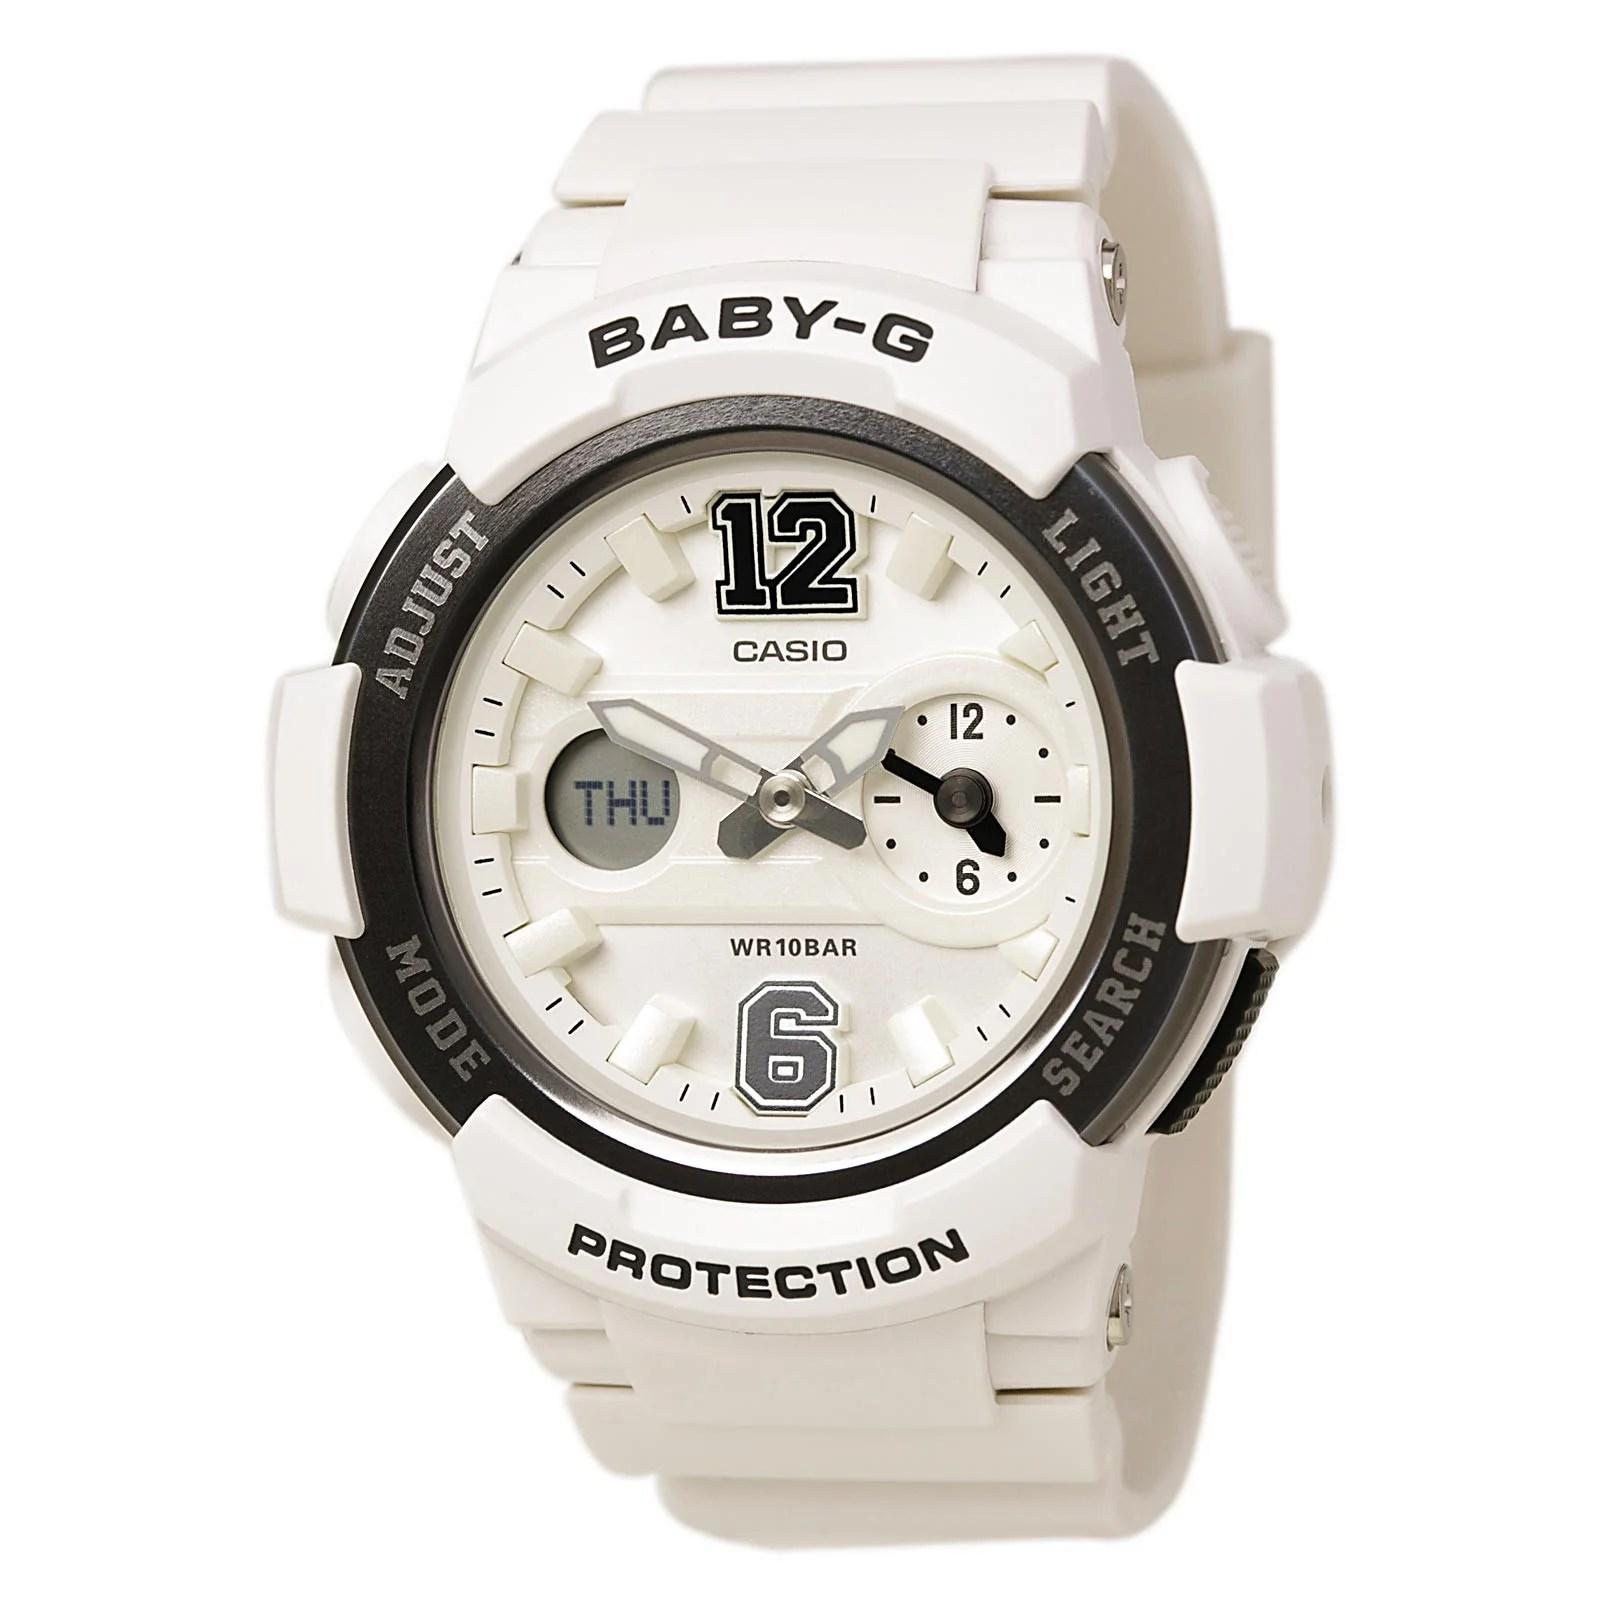 Casio BGA210-7B1 Lady's Ana-Digi White Dial White Band Alarm Watch